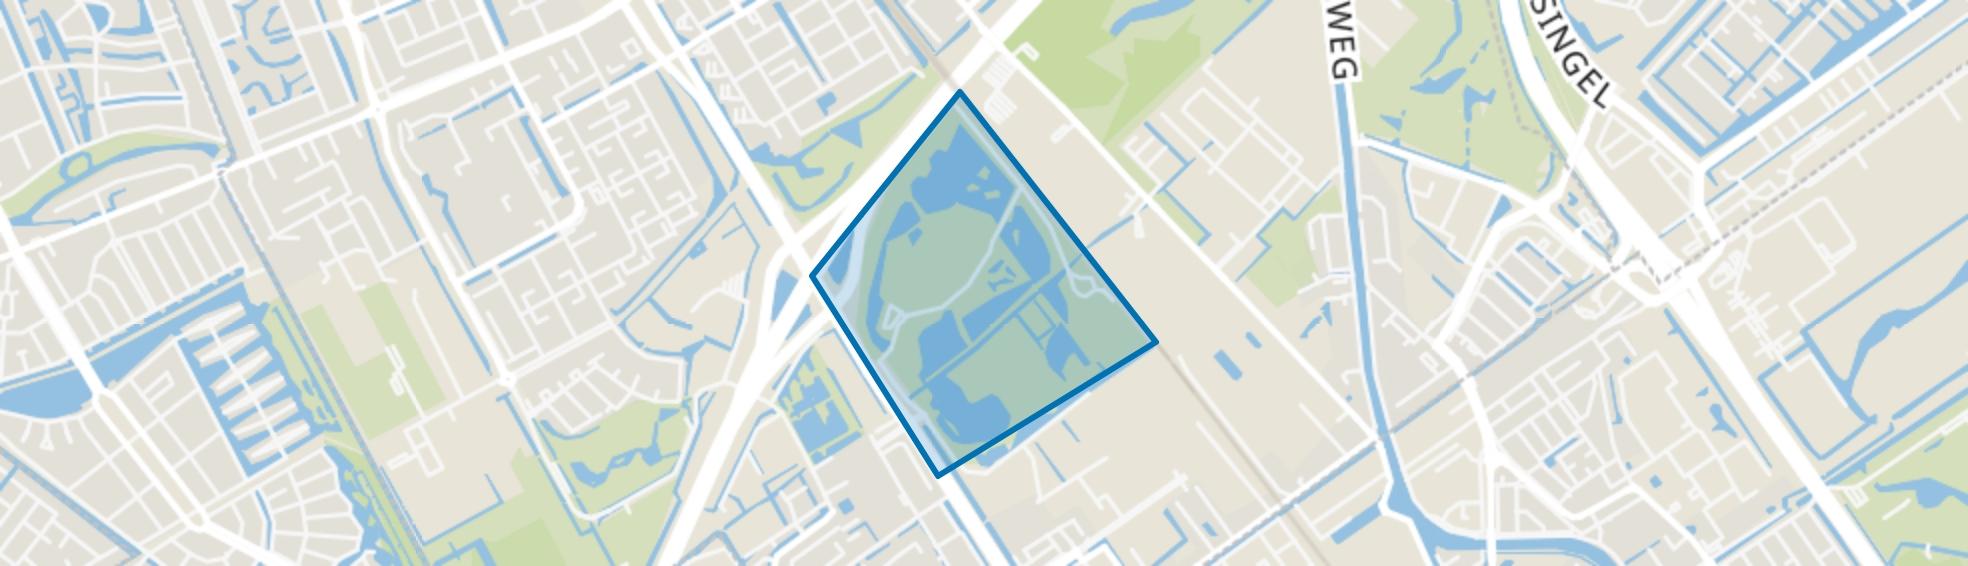 Wilhelminapark, Rijswijk (ZH) map